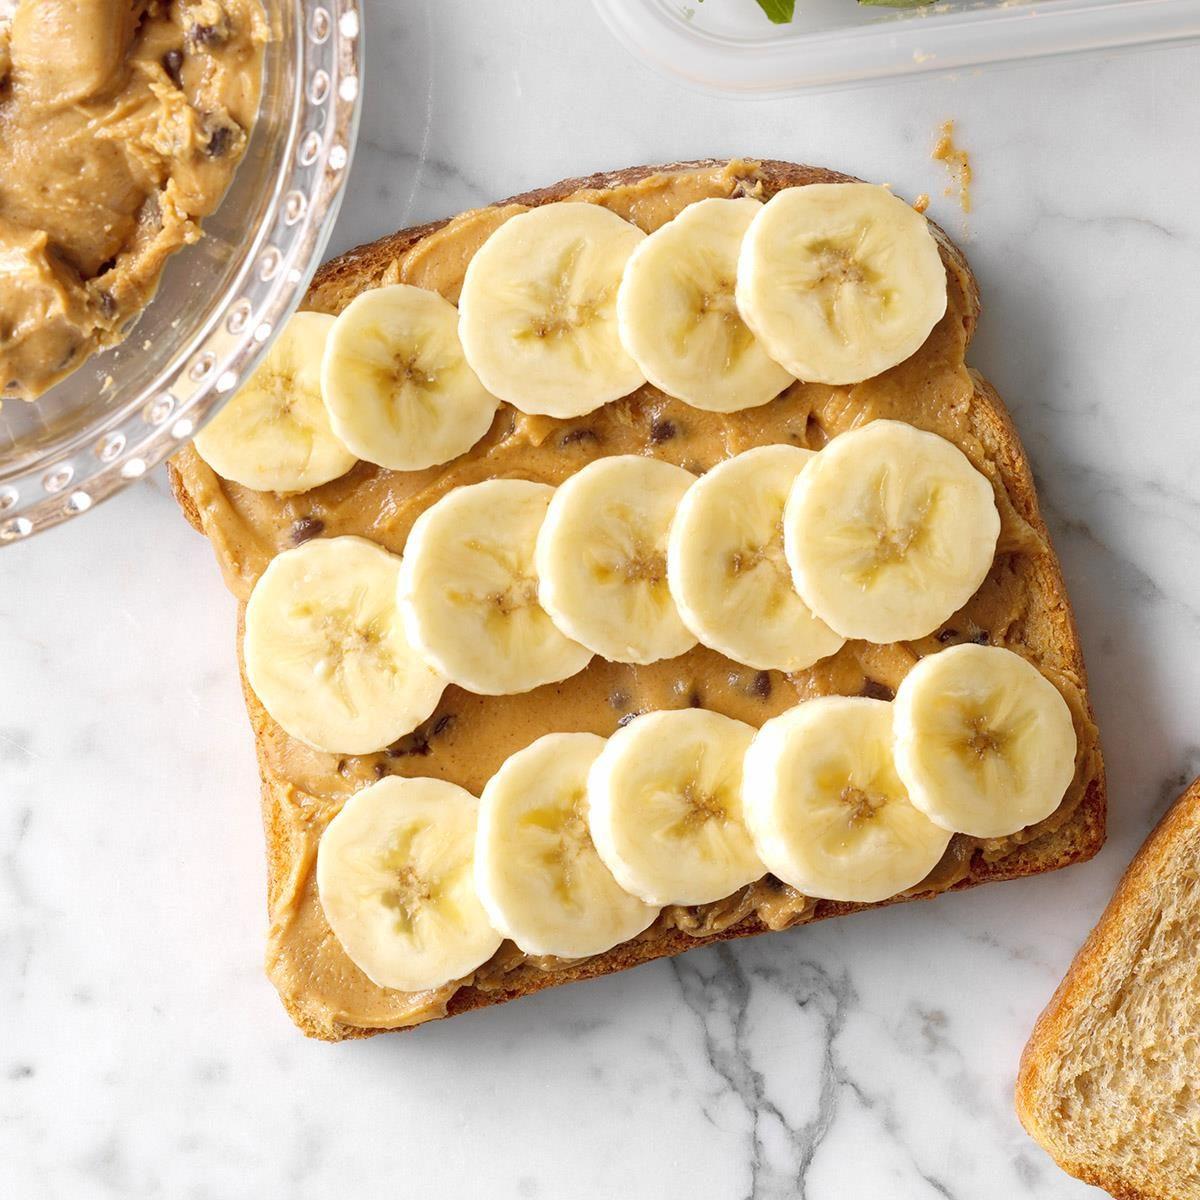 Elementary Age: Chocolate Chip, PB & Banana Sandwiches